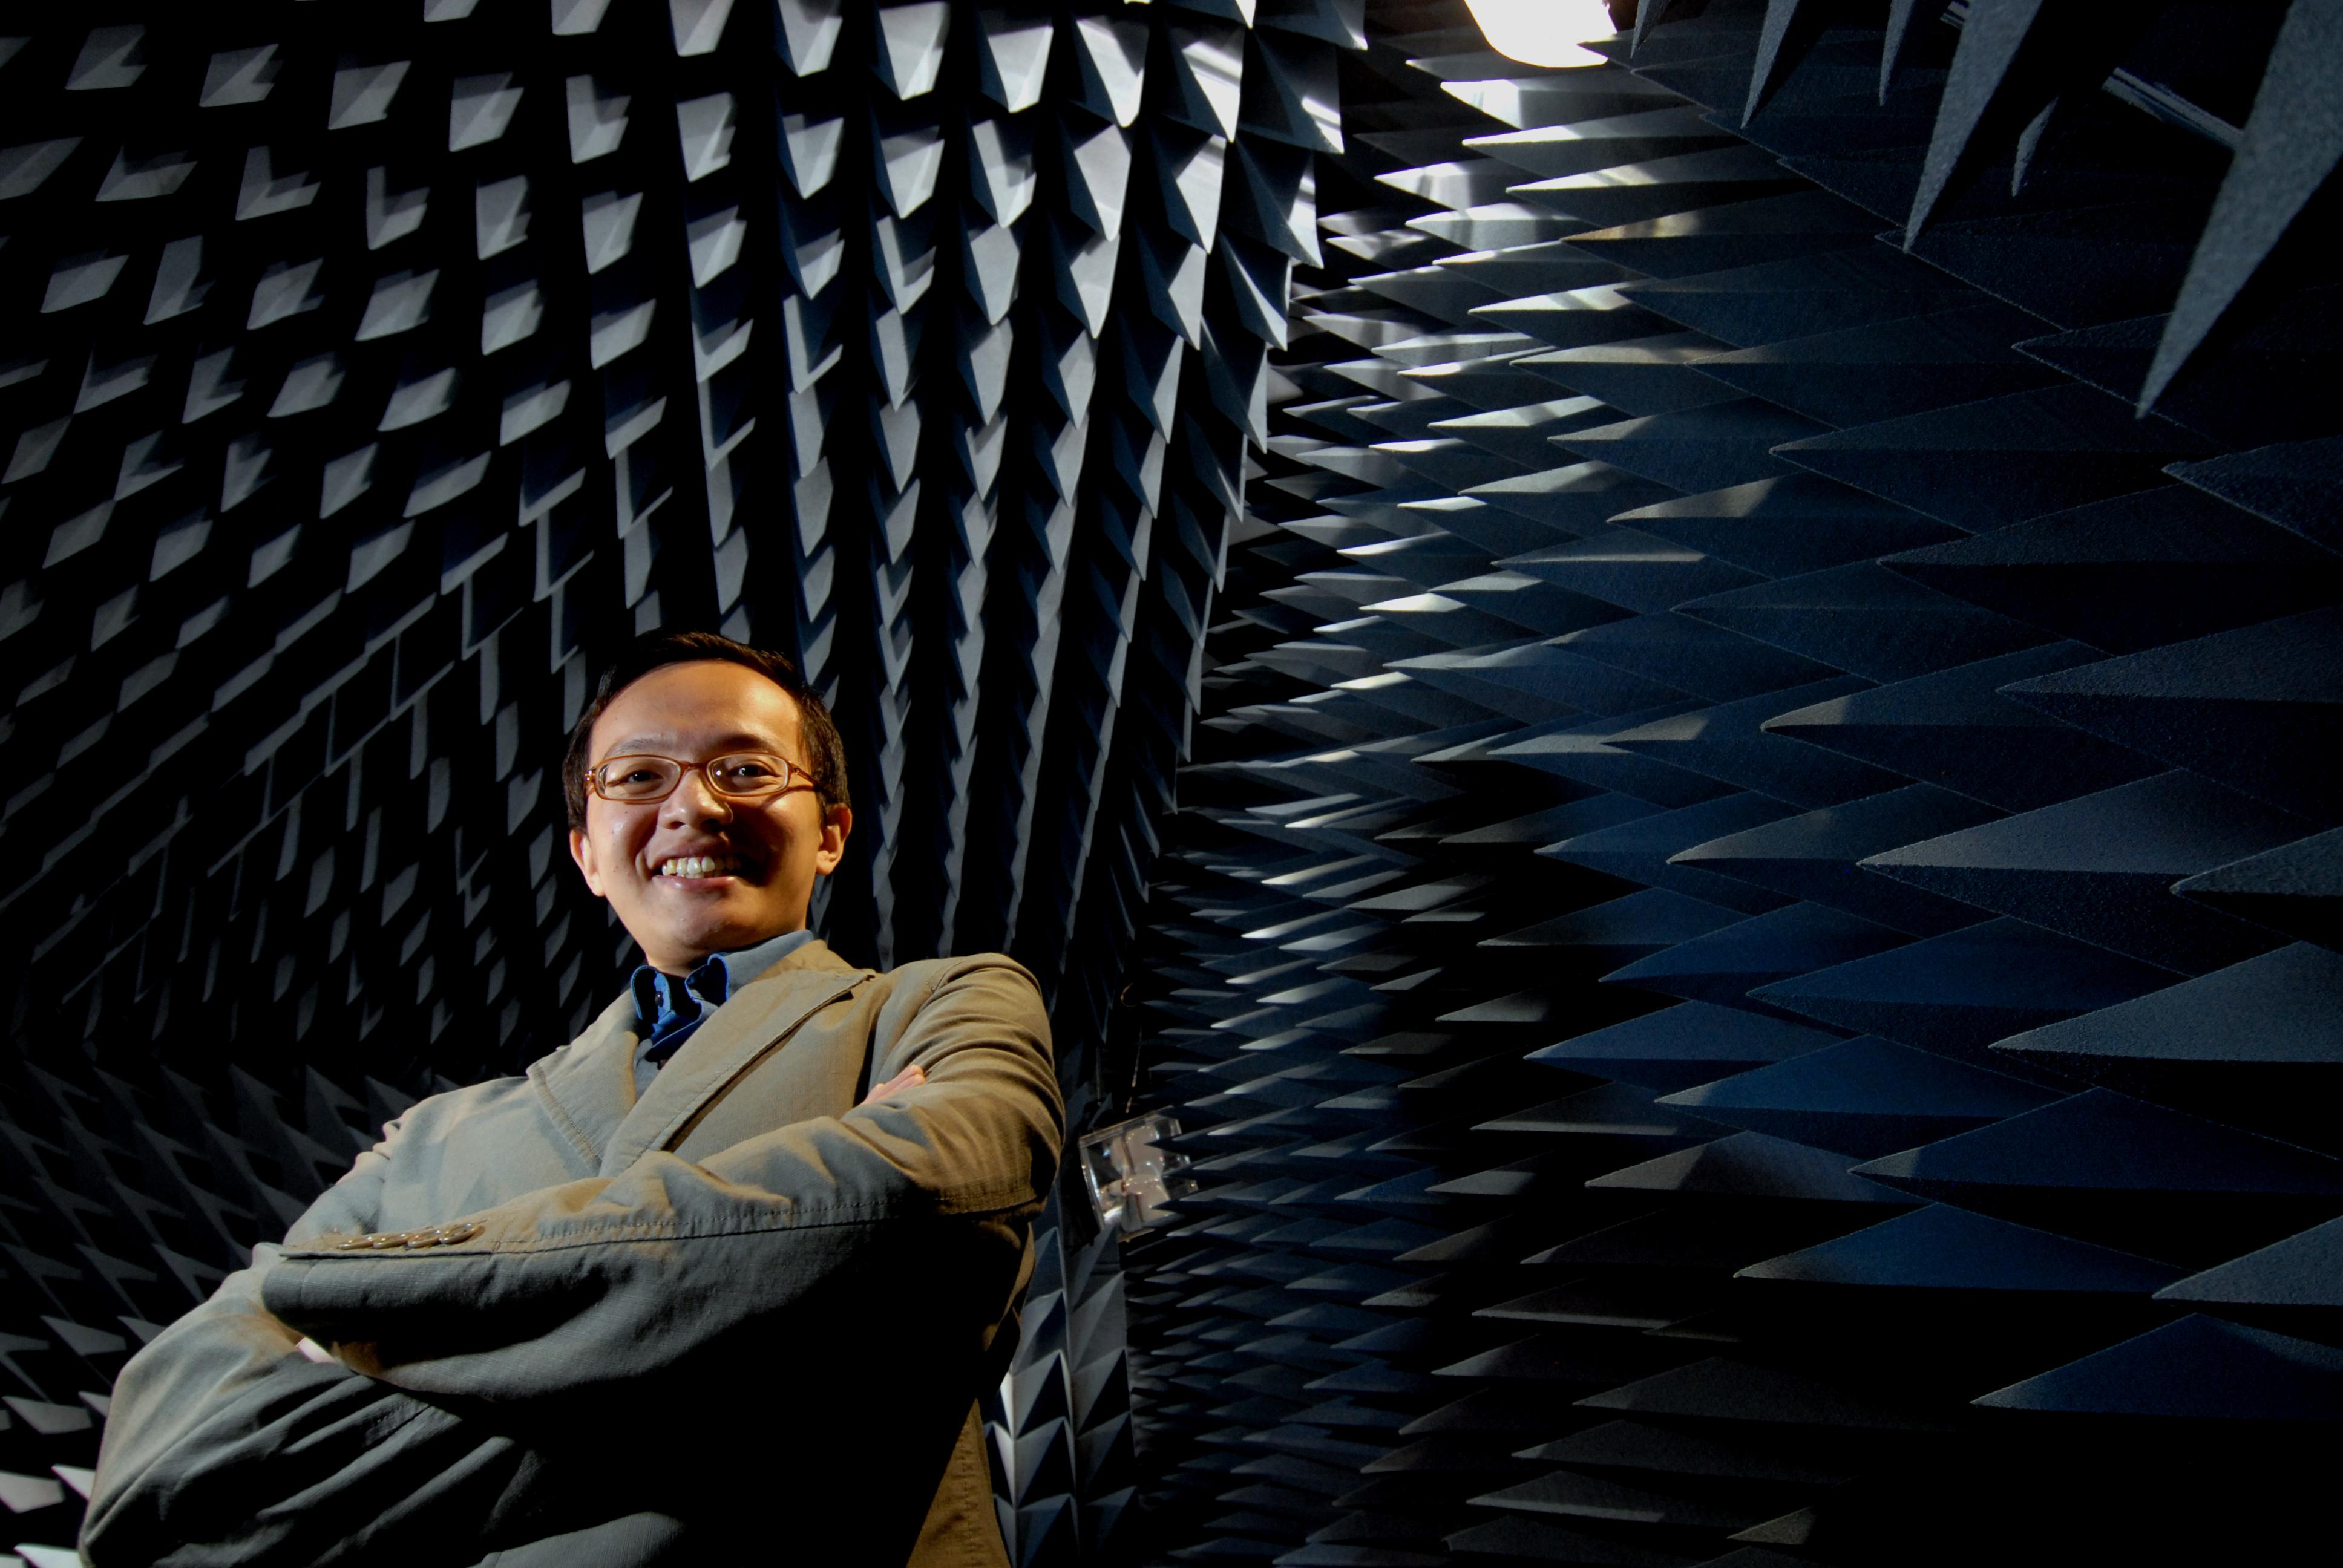 Dr Yifan Chen